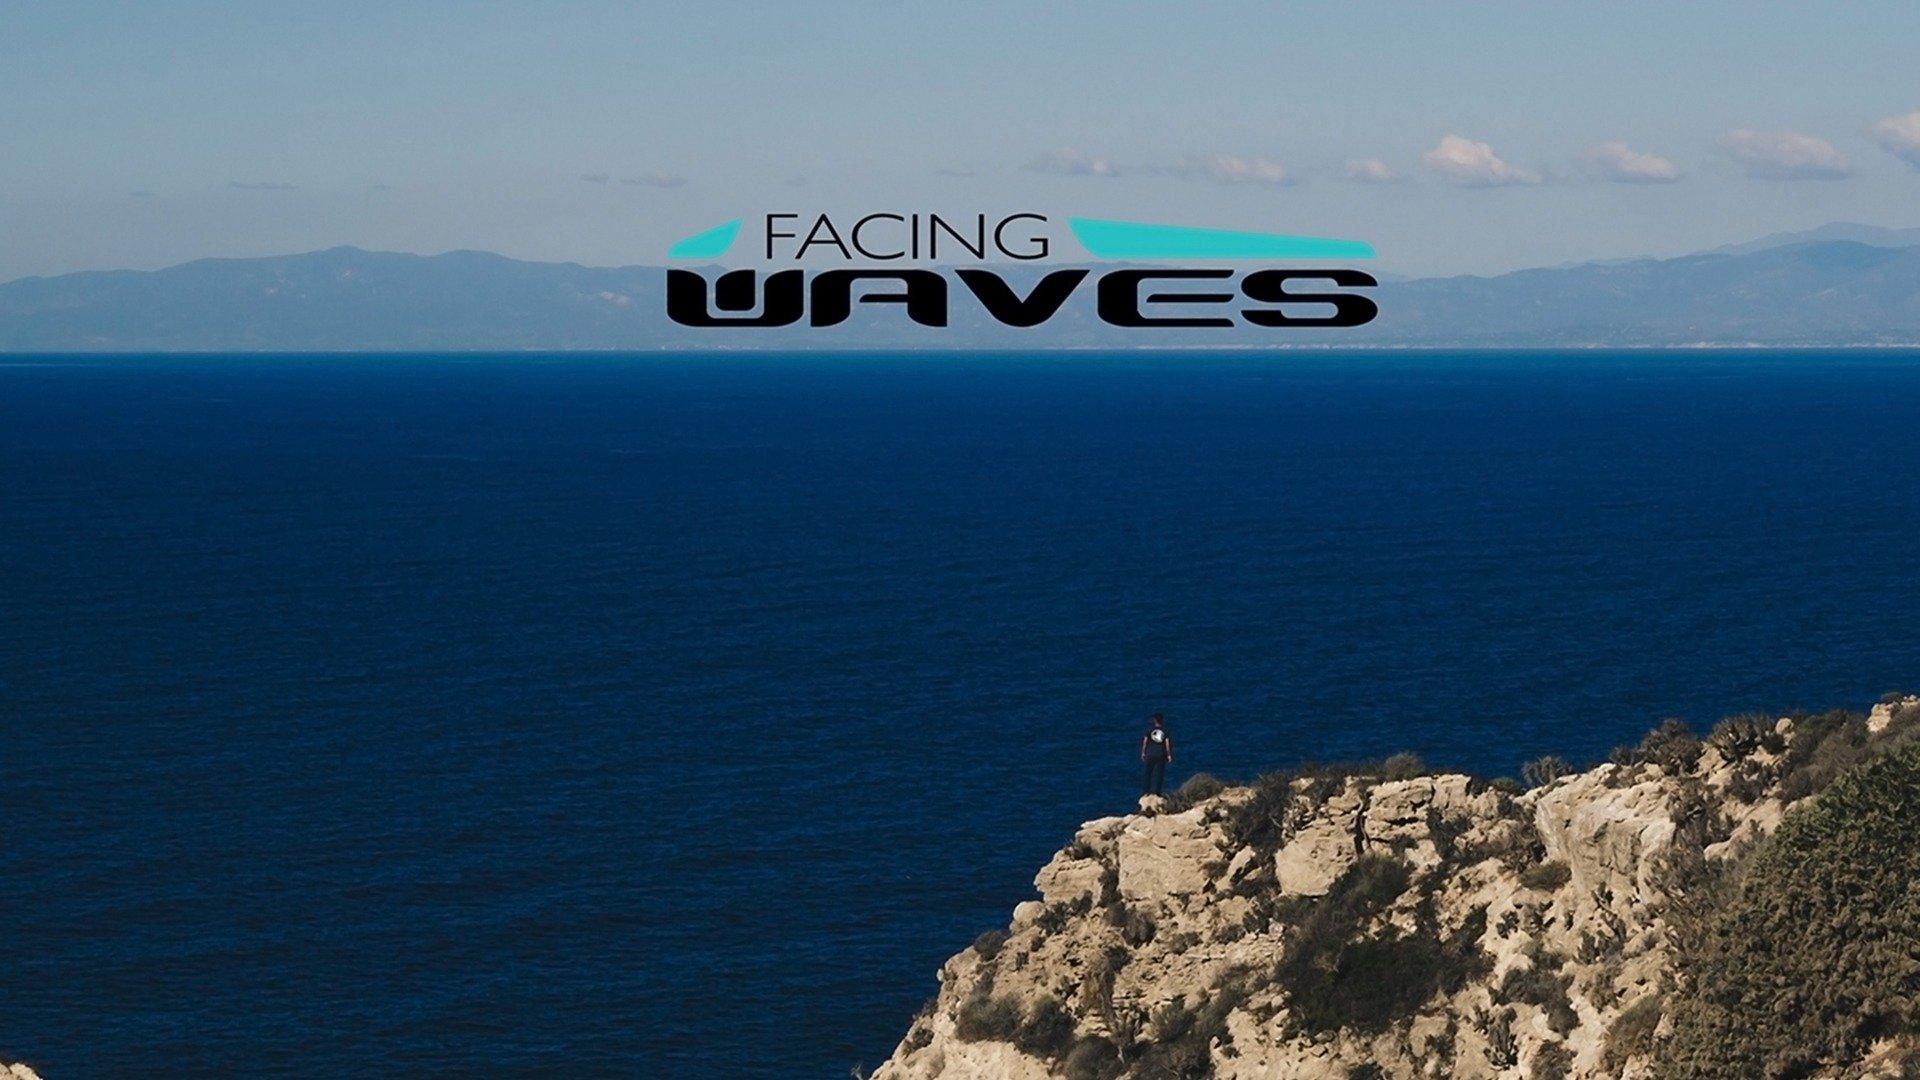 Facing Waves